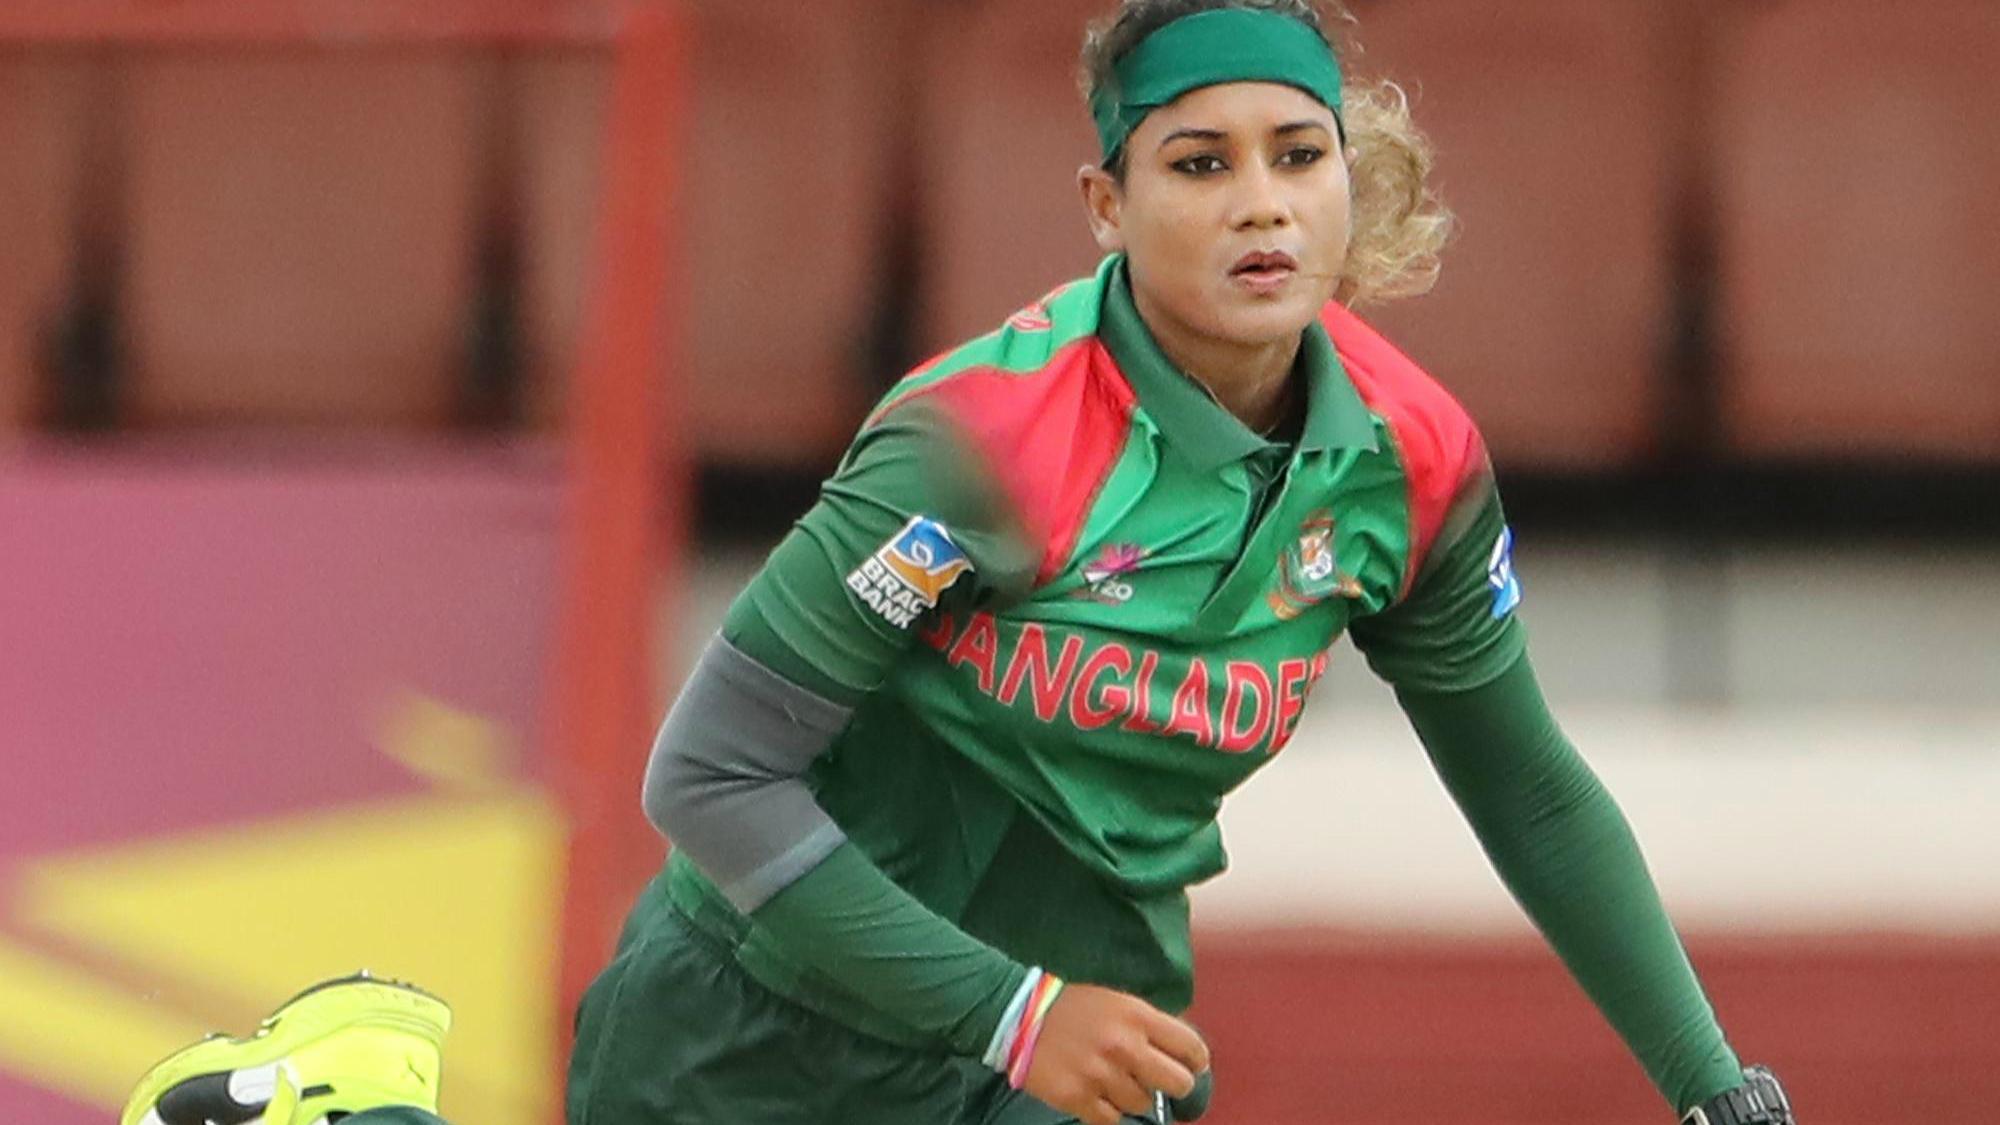 Jahanara Alam of Bangladesh bowls during the ICC Women's World T20 warm up match between Bangladesh and Ireland on November 4, 2018 at the Guyana National Stadium in Providence, Guyana.